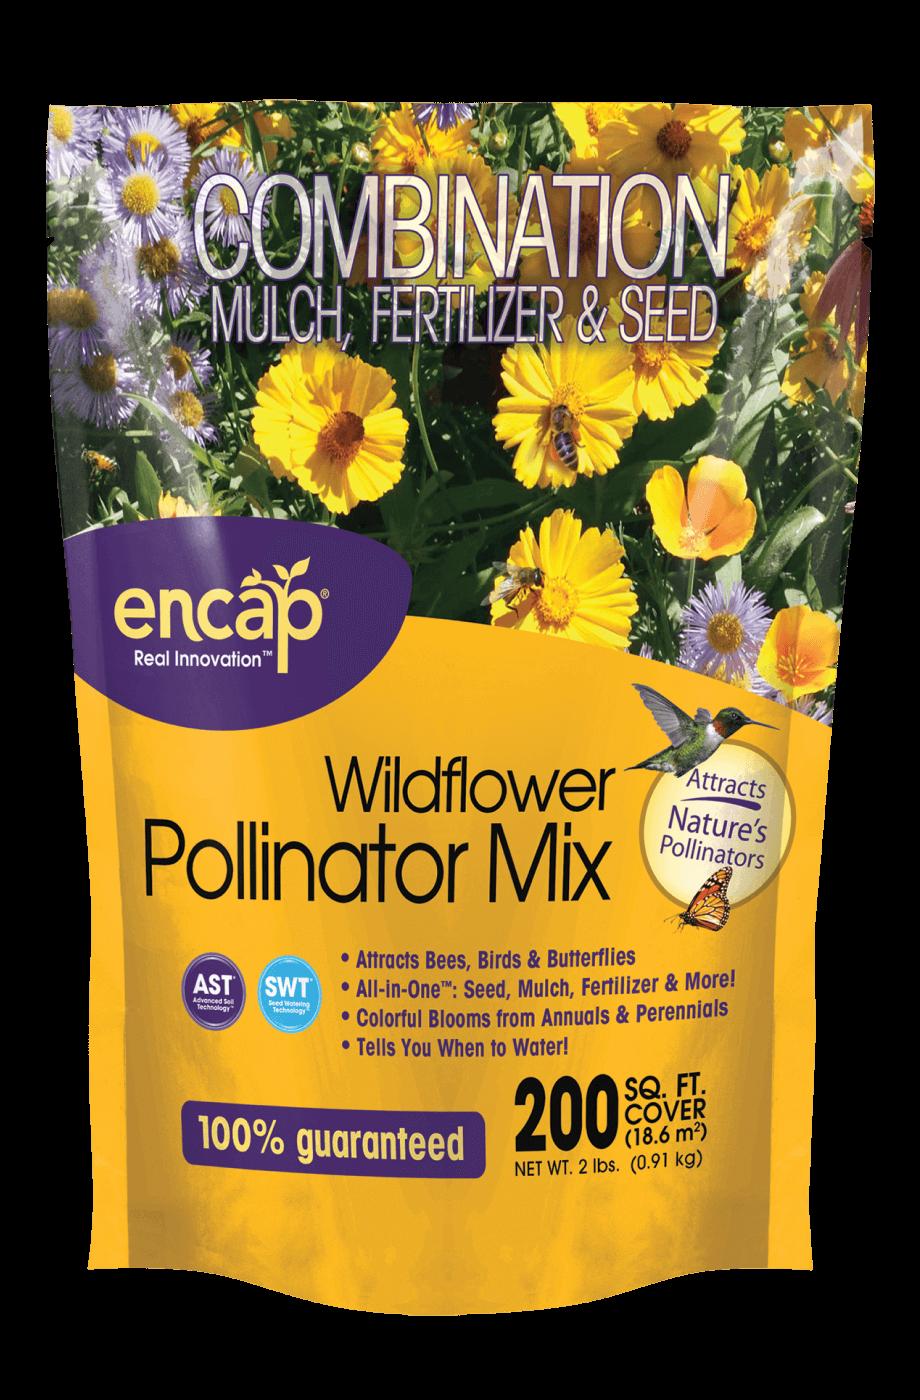 Wildflower Pollinator Mix Package